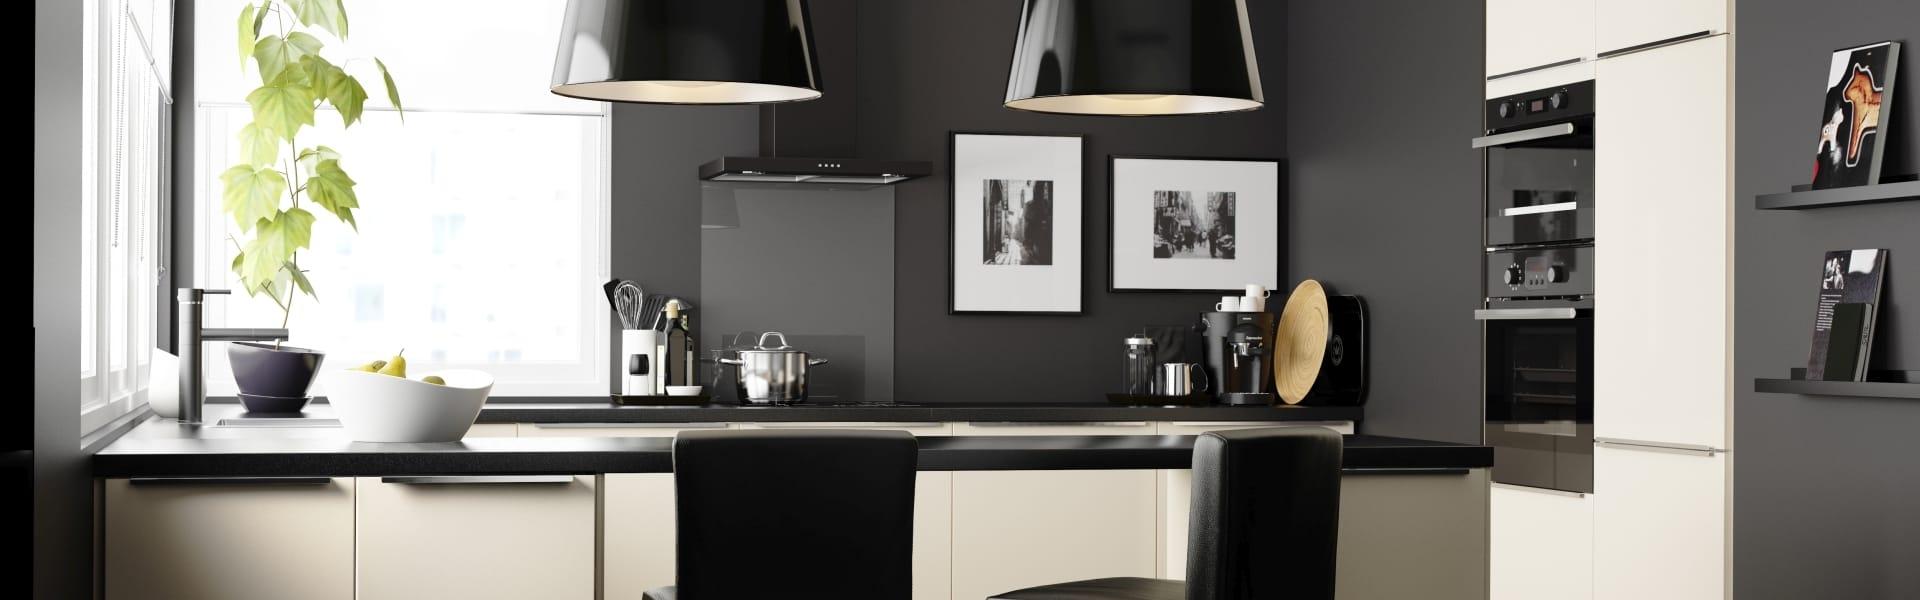 A minimalist black-and-white kitchen